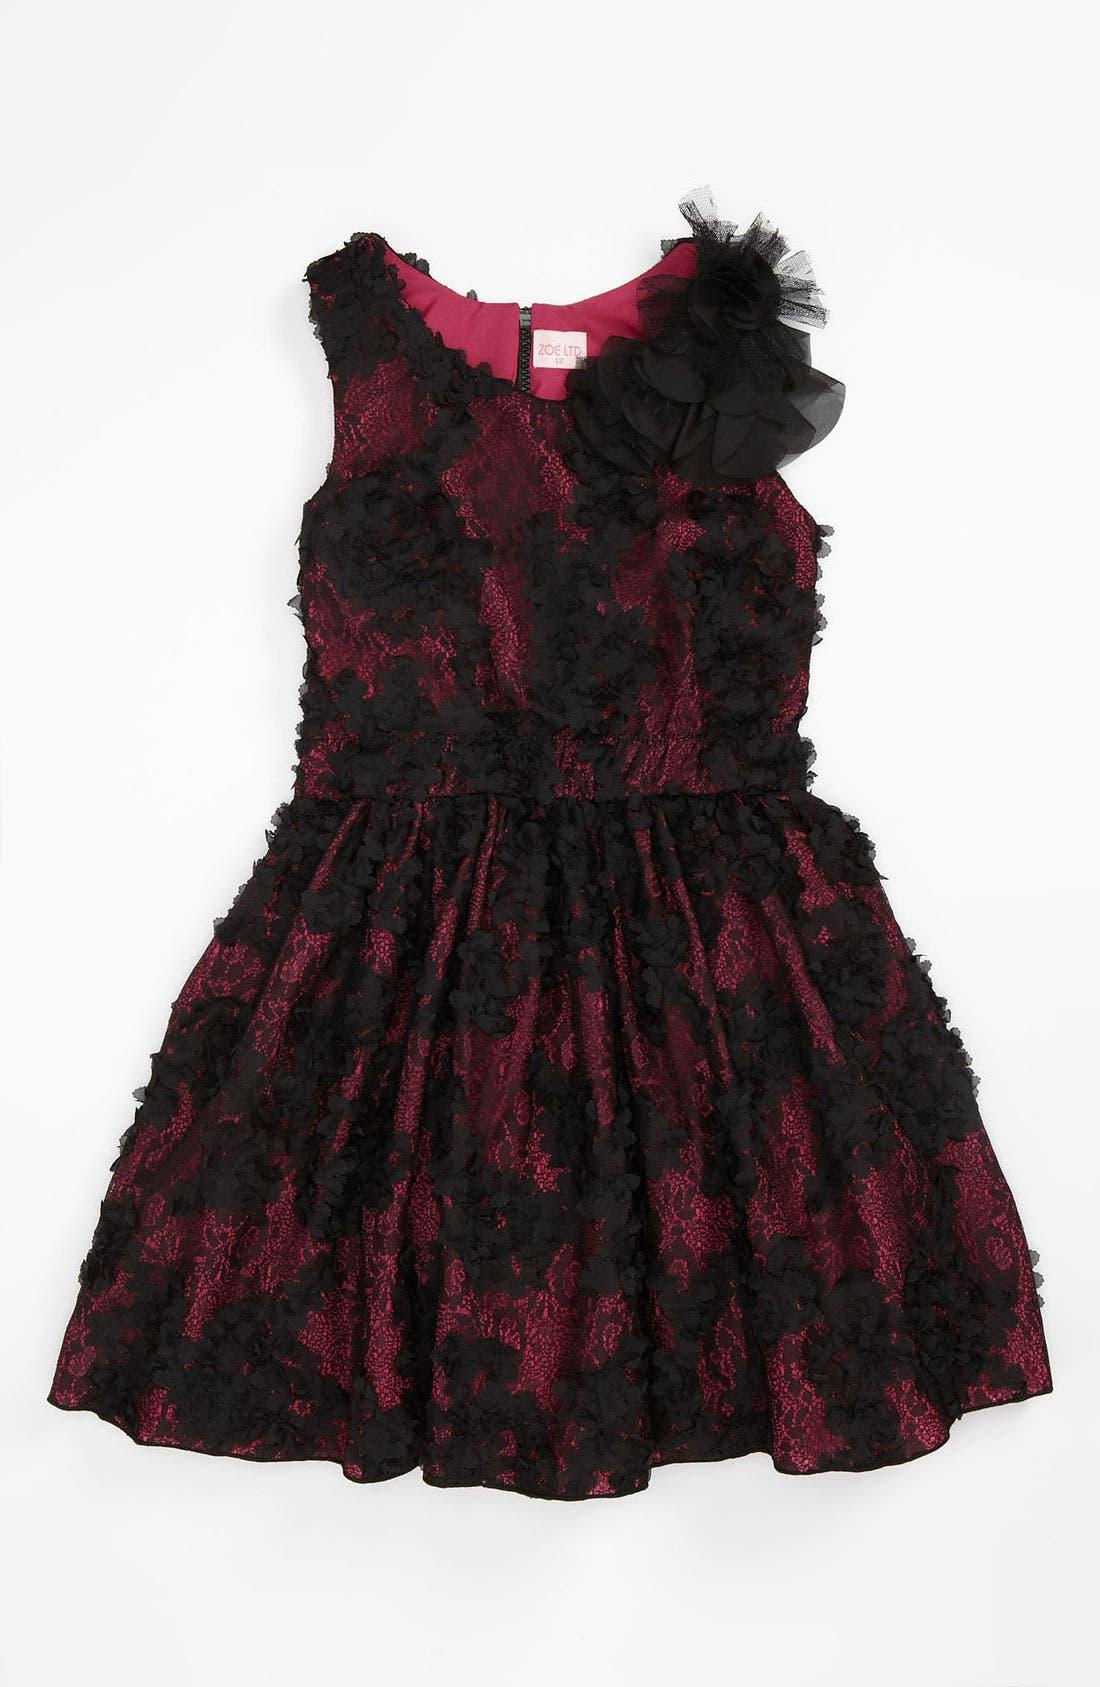 Alternate Image 1 Selected - Zoe Ltd Floral Mesh Dress (Big Girls)